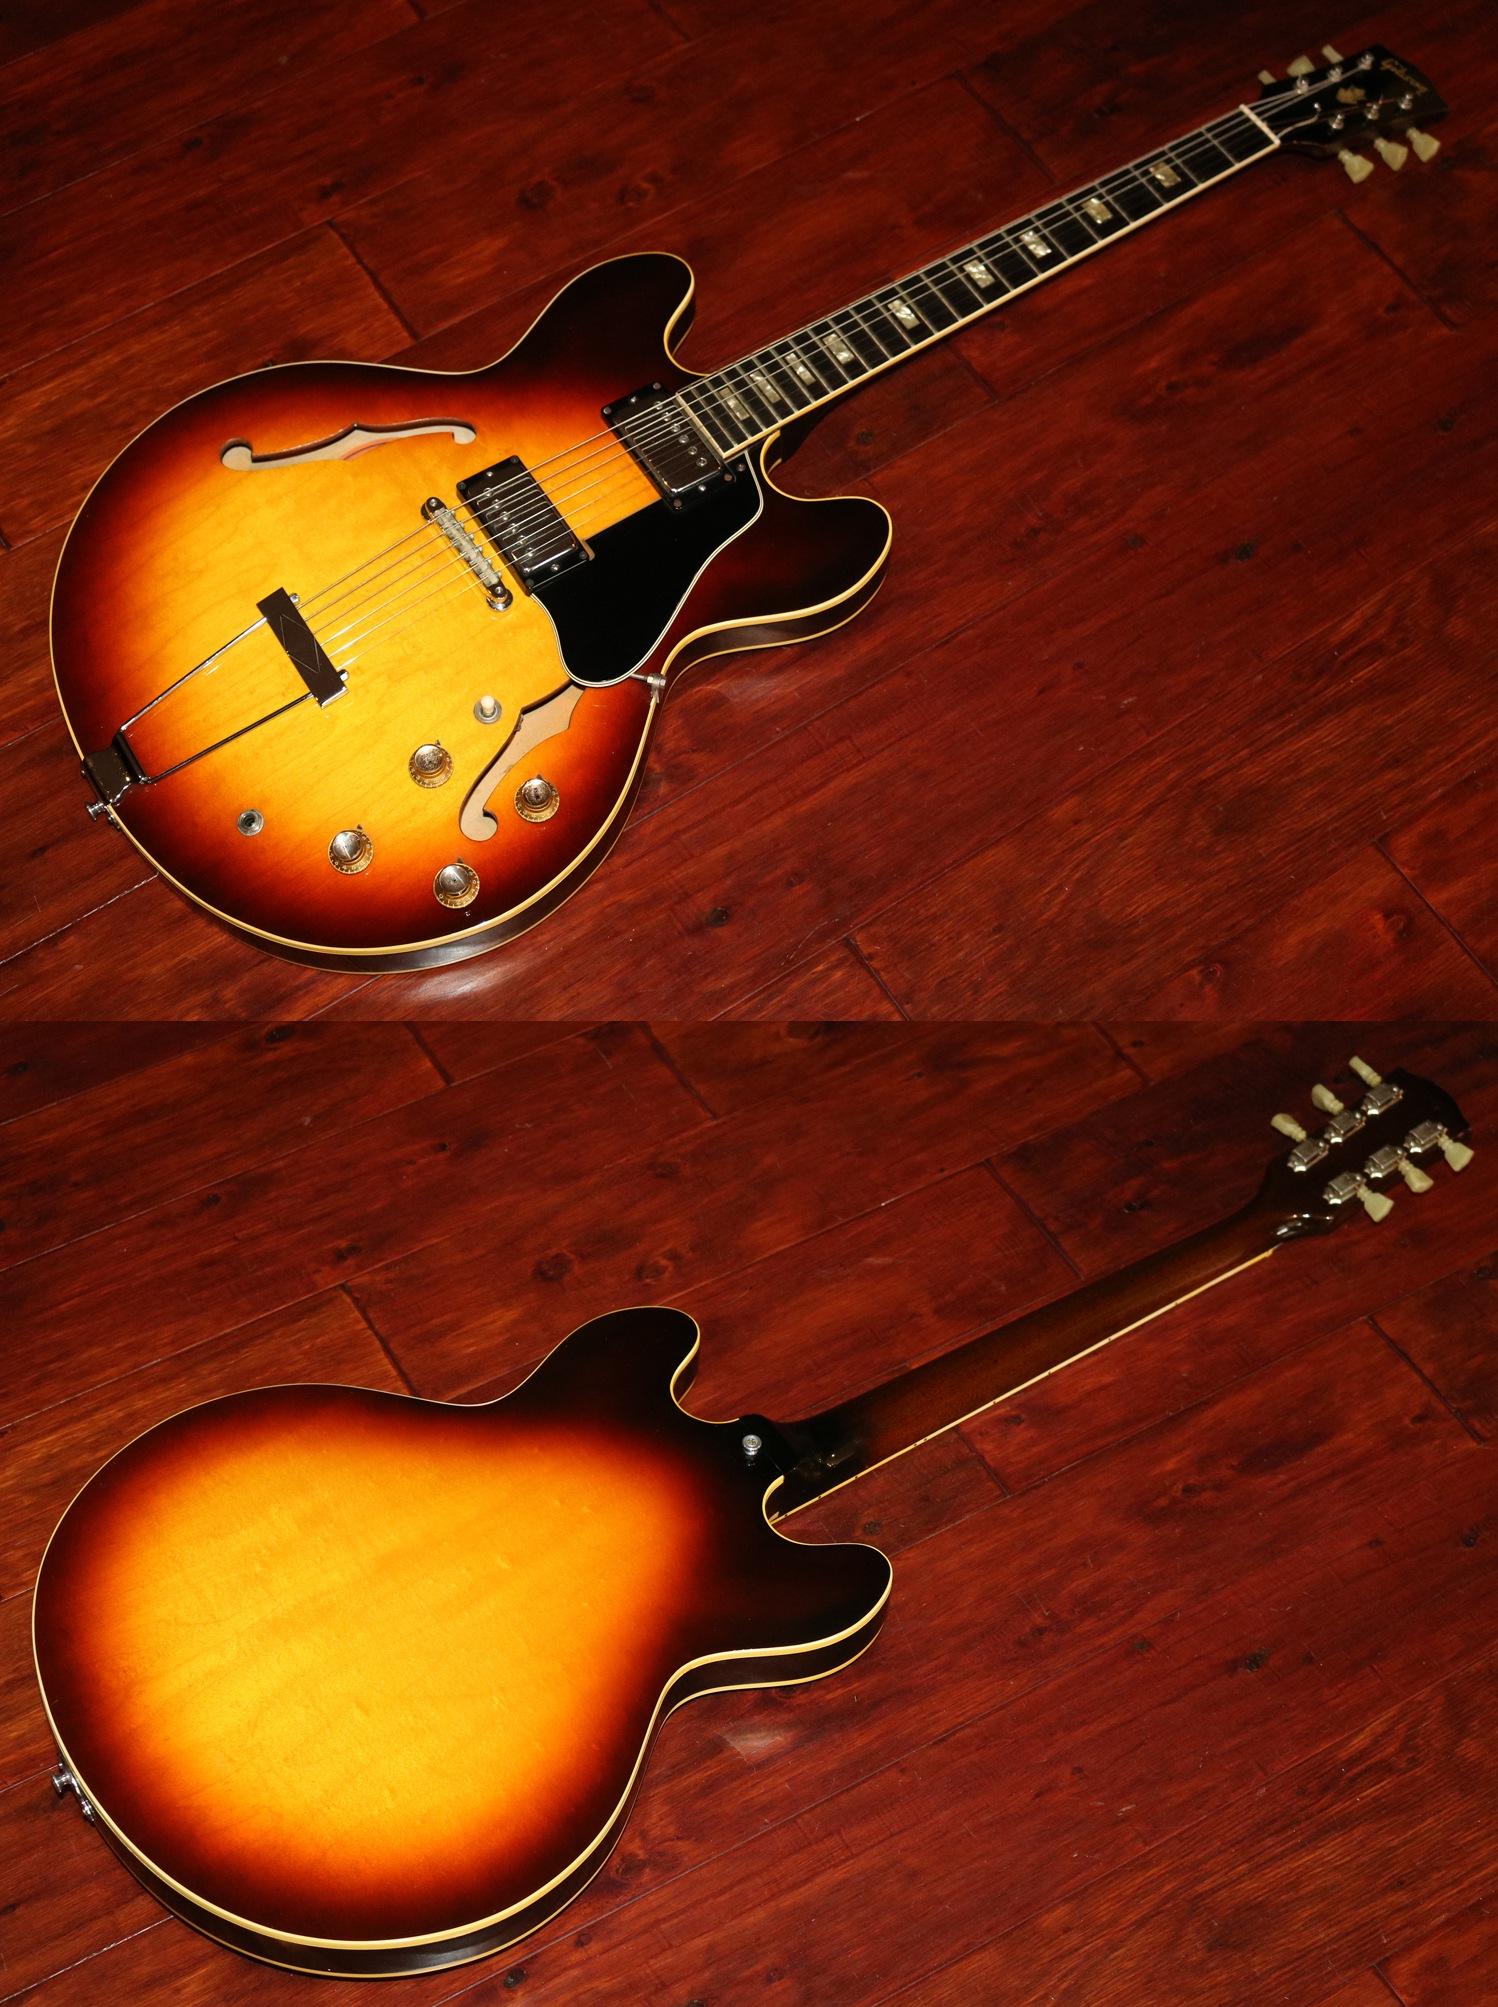 1968 Gibson ES-335 TD | Garys Classic Guitars & Vintage